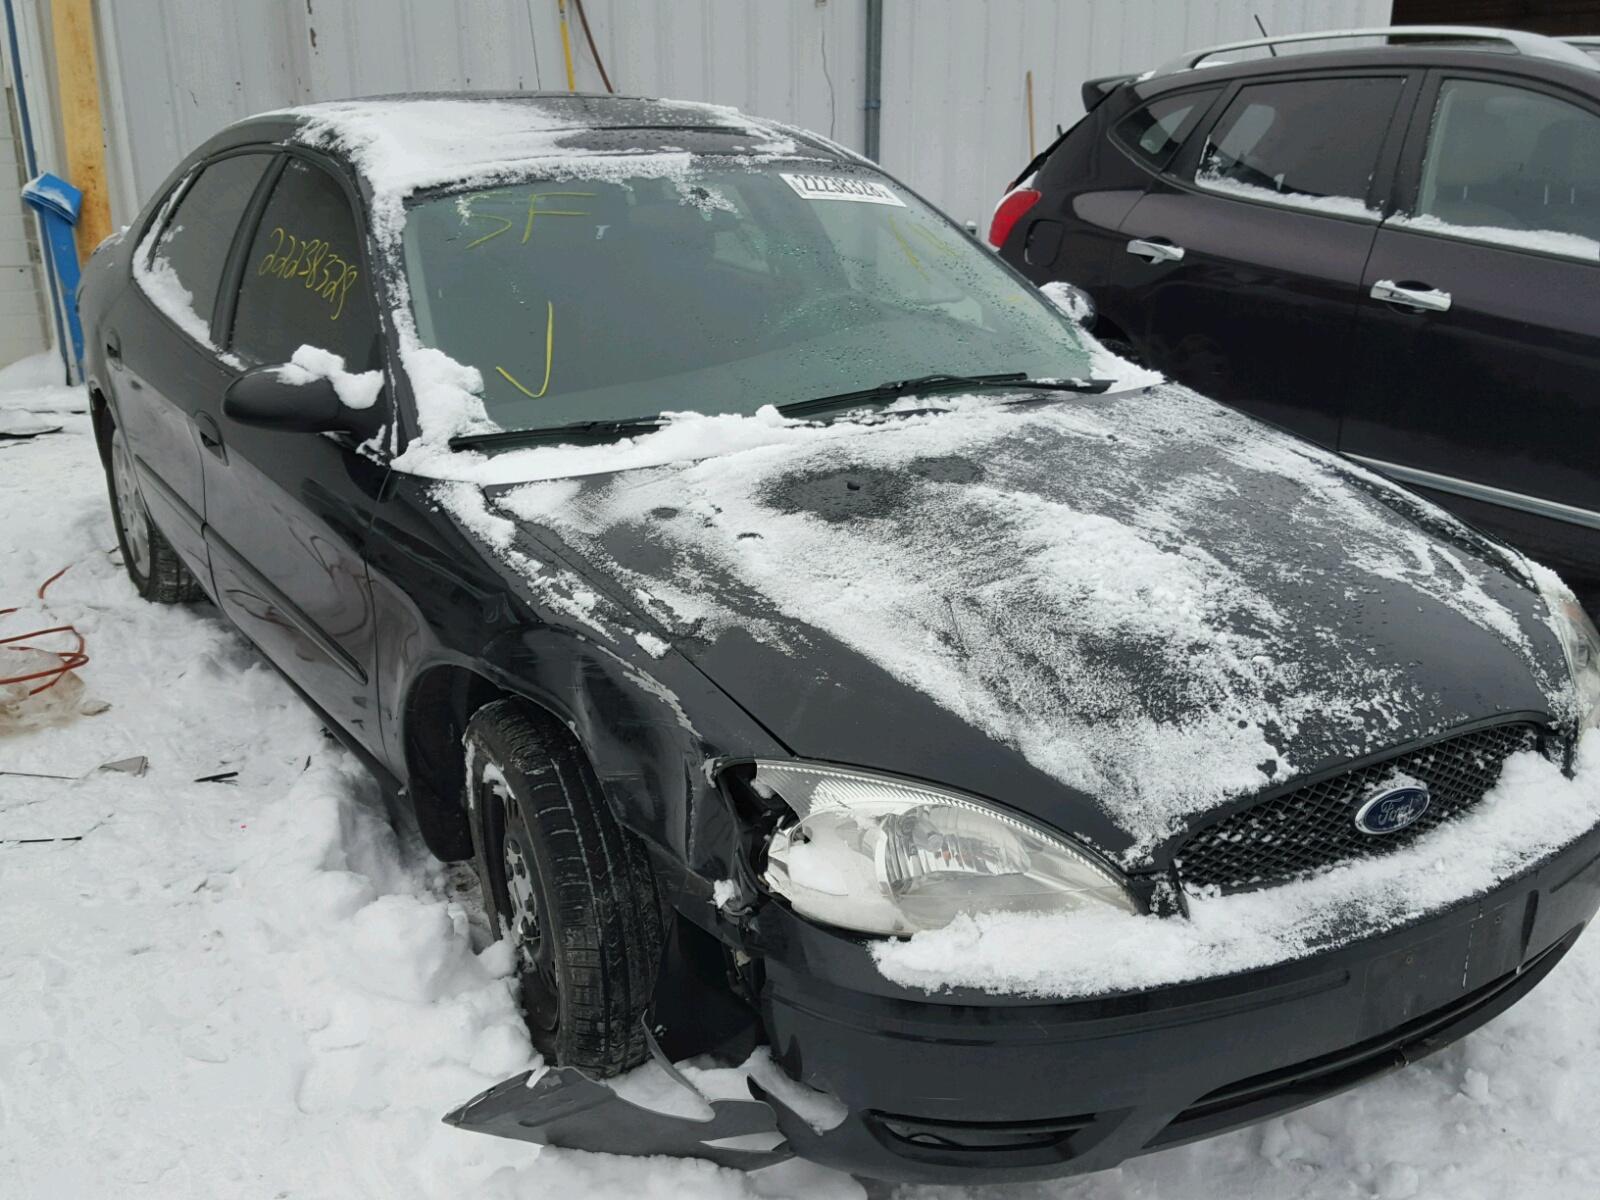 2007 Ford Taurus Se All Over Damage 1FAFP53U27A Sold